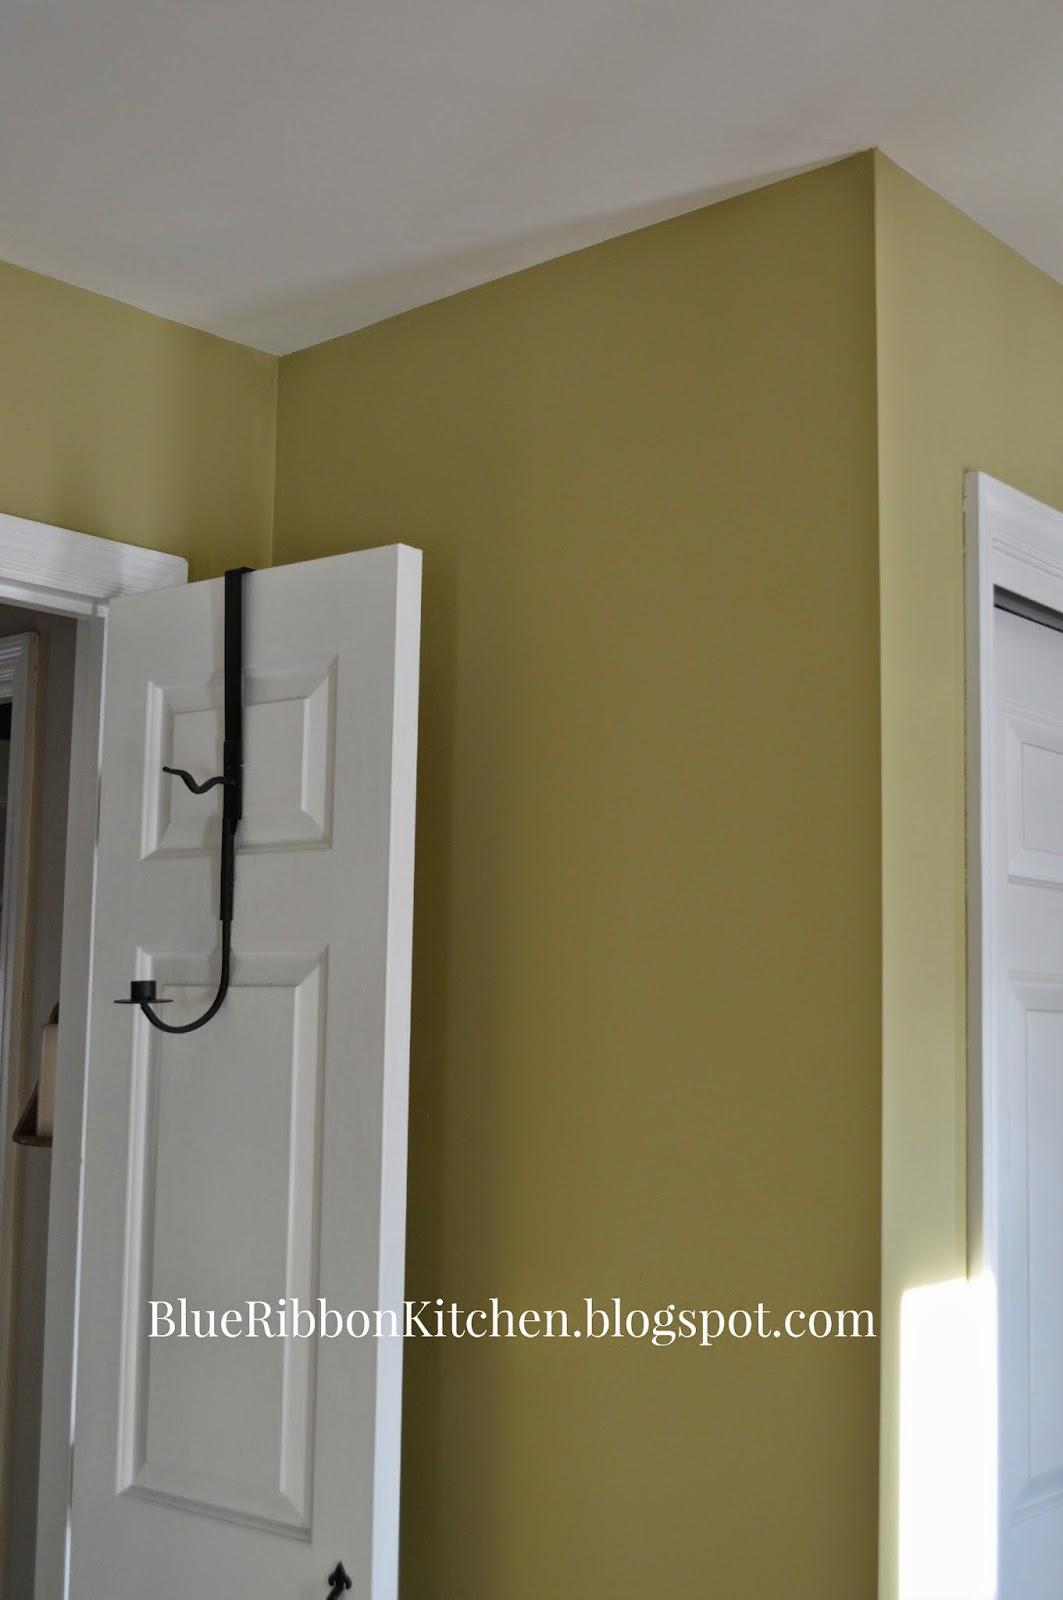 Blue Ribbon Kitchen 50 Shades Of Gray Paint